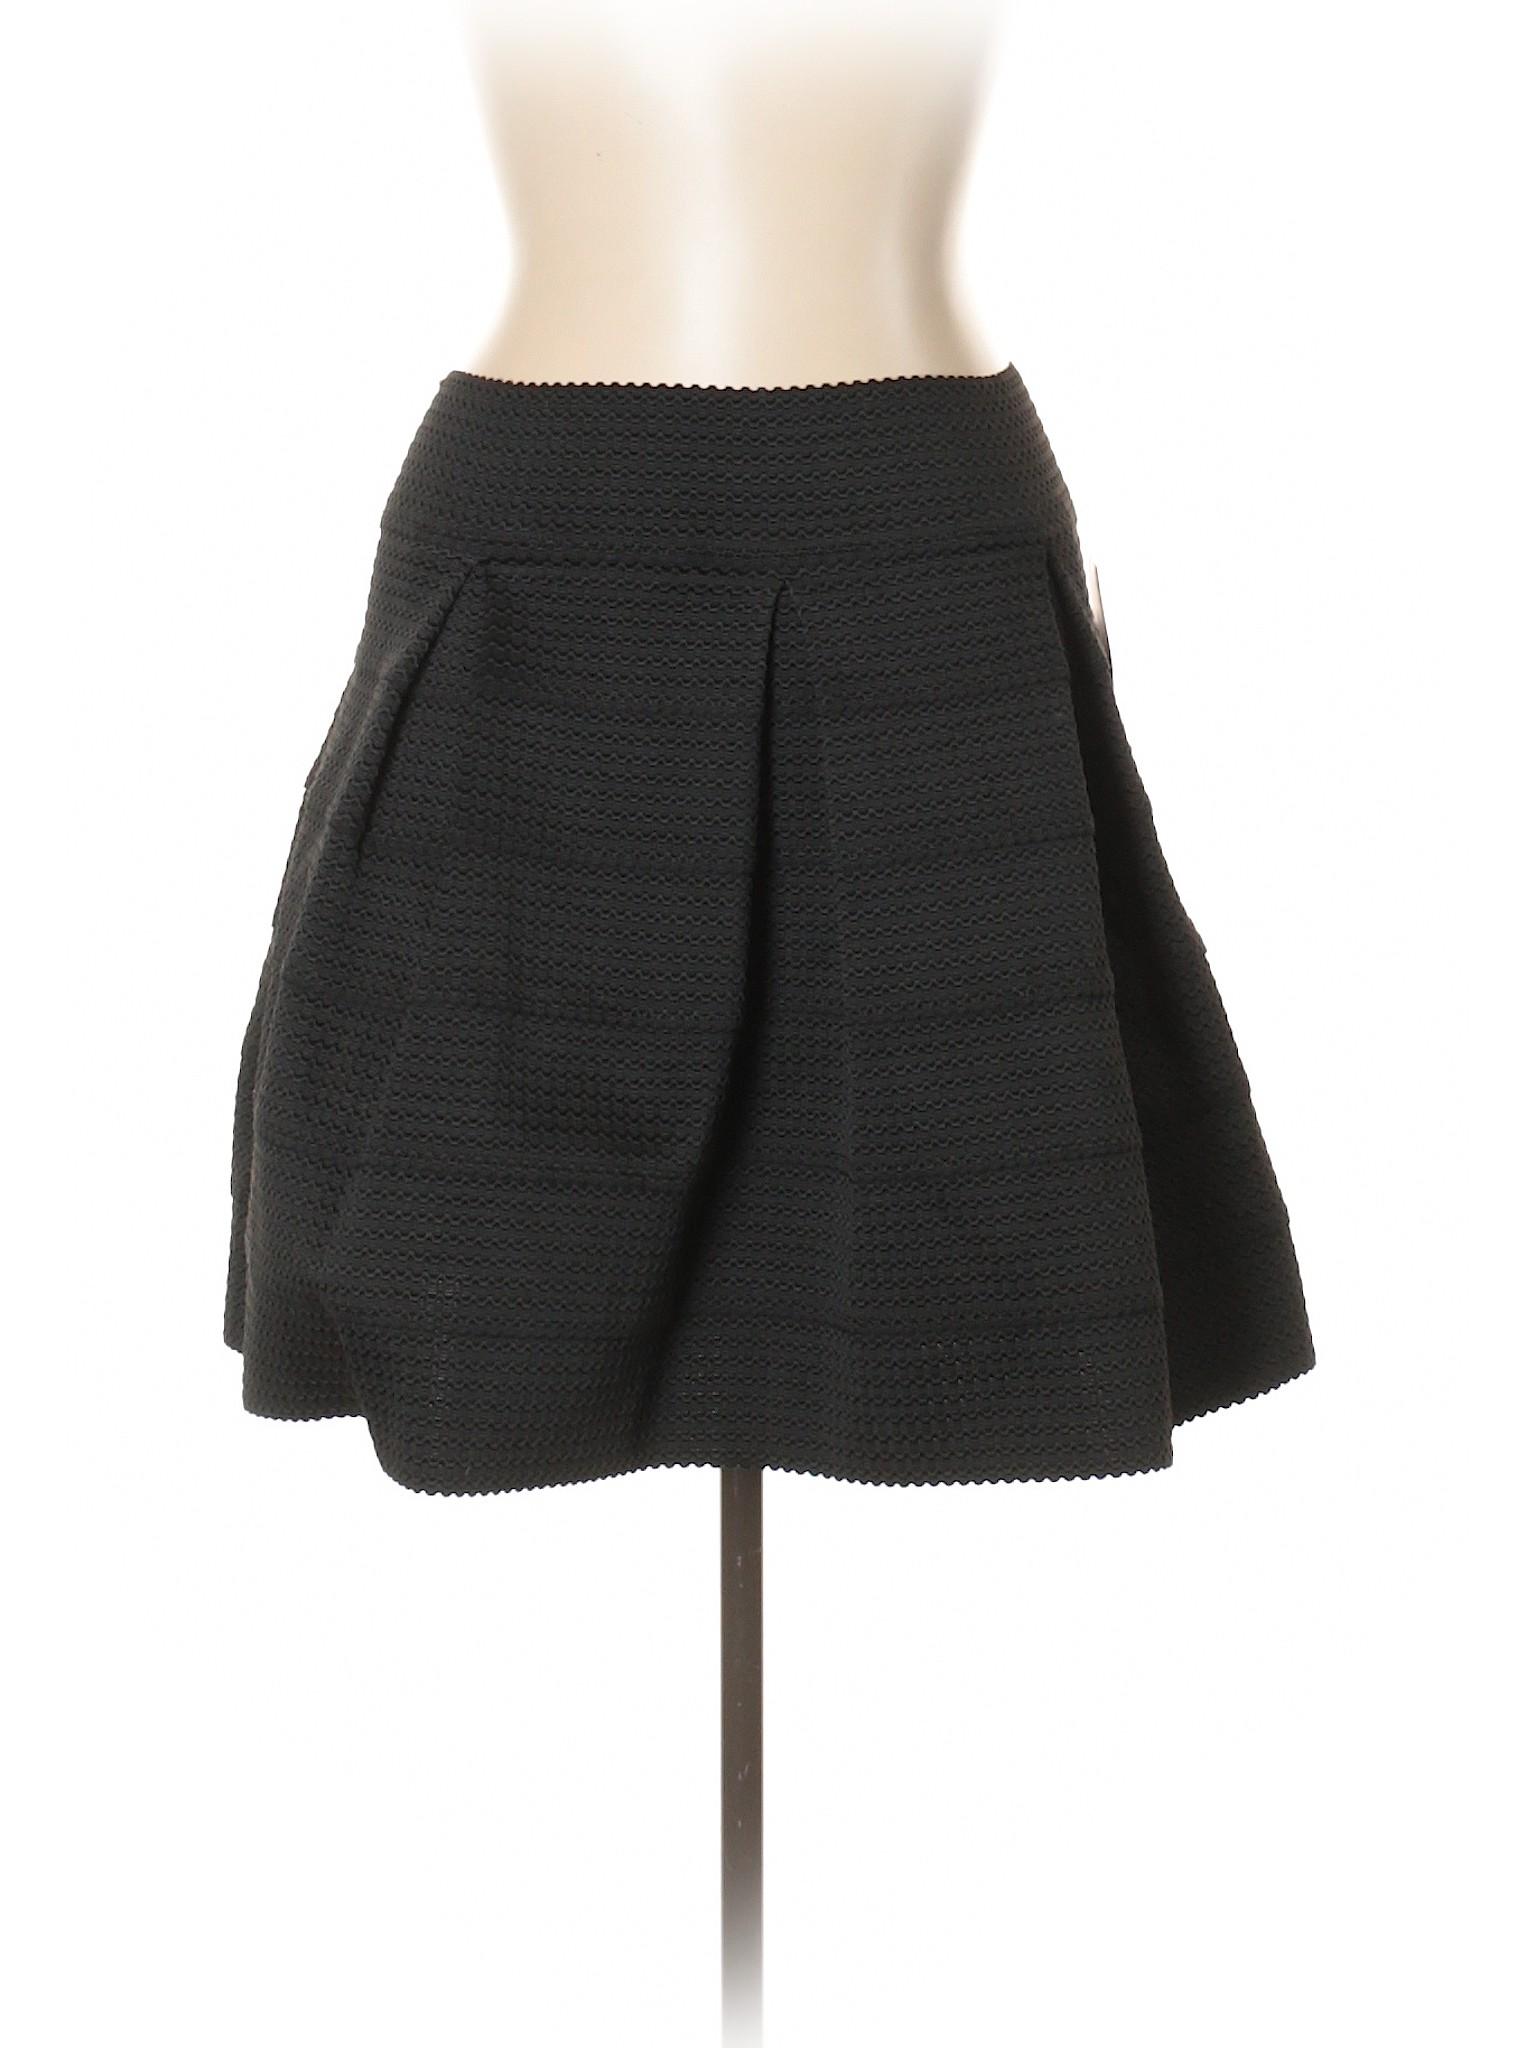 Casual Leisure winter Xhilaration Xhilaration winter Skirt Leisure H66Xdrxqw